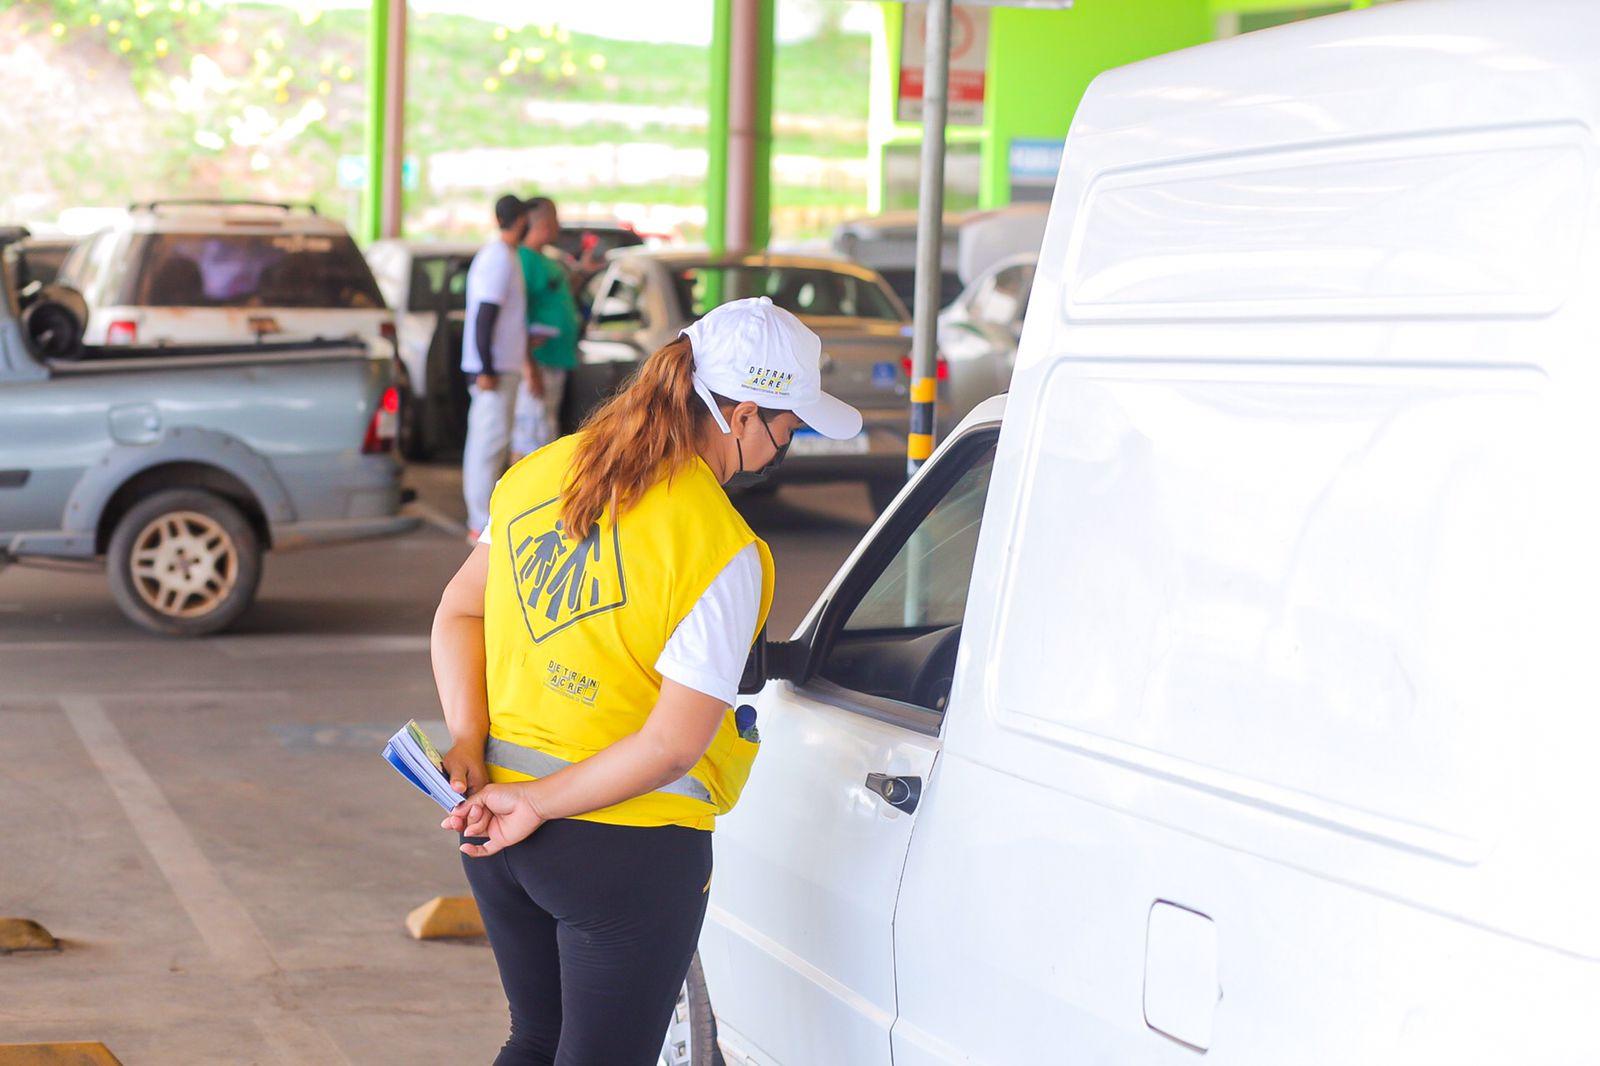 Detran orienta condutores sobre a importância do respeito às vagas reservadas